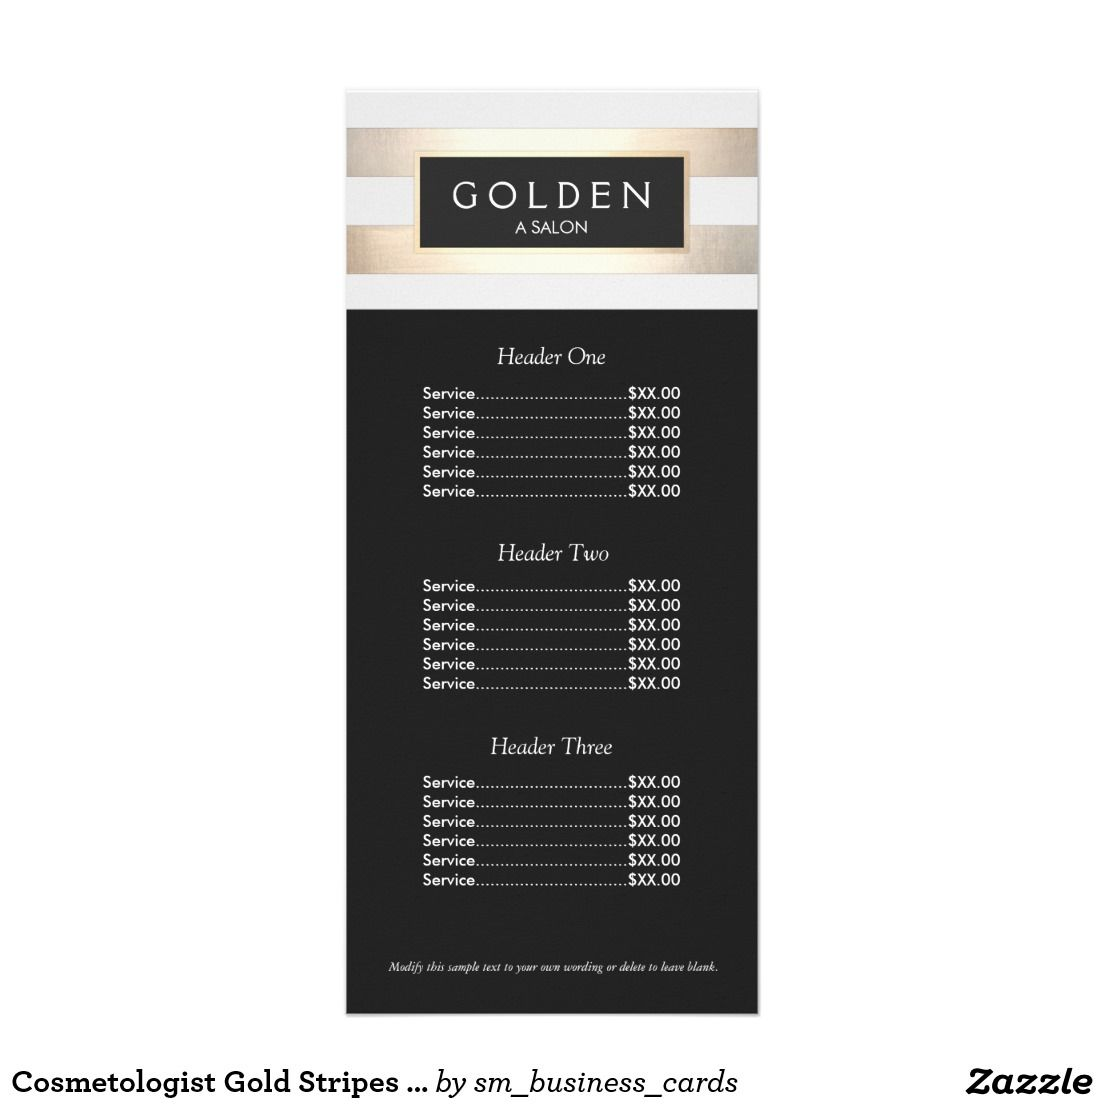 Cosmetologist Gold Stripes Hair Salon A Price Menu Rack Card Template